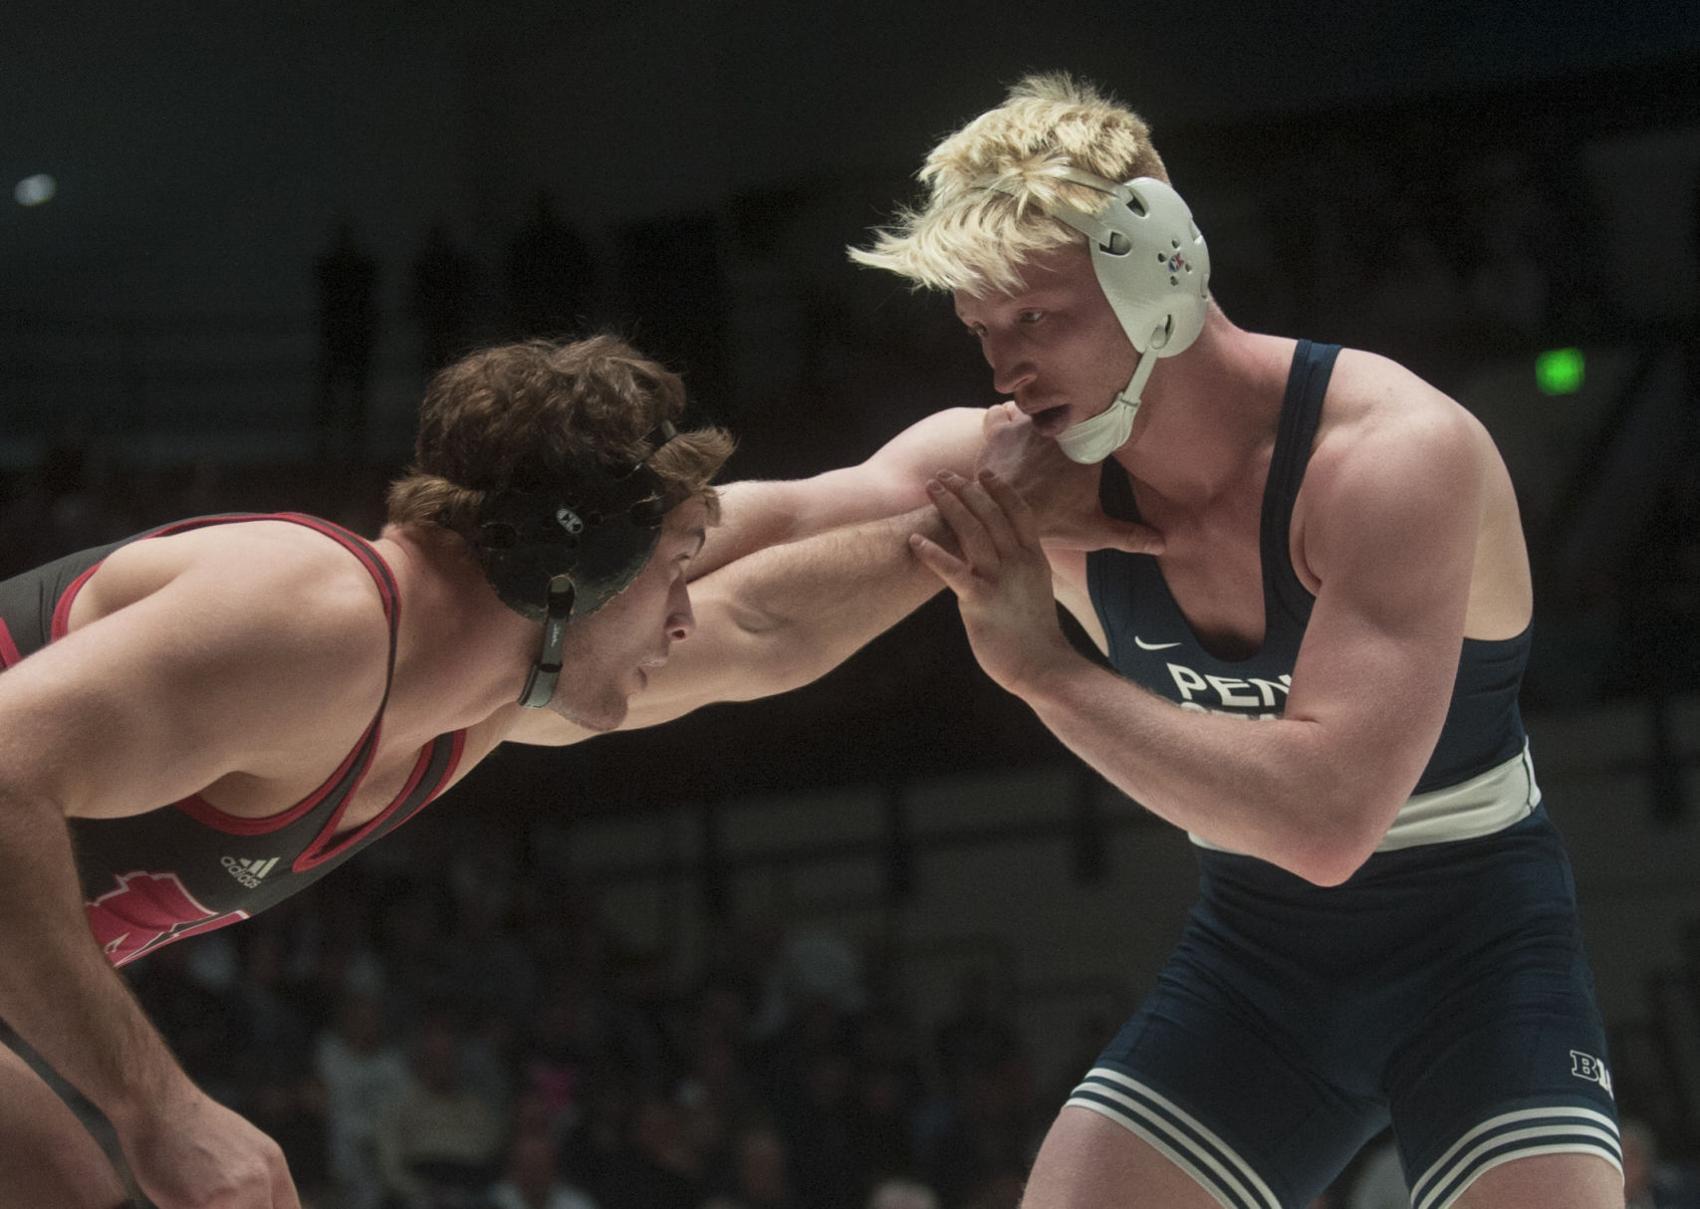 DAILY COLLEGIAN: Former Penn State wrestler Bo Nickal claims U23 Senior World championship crown at 92 kg